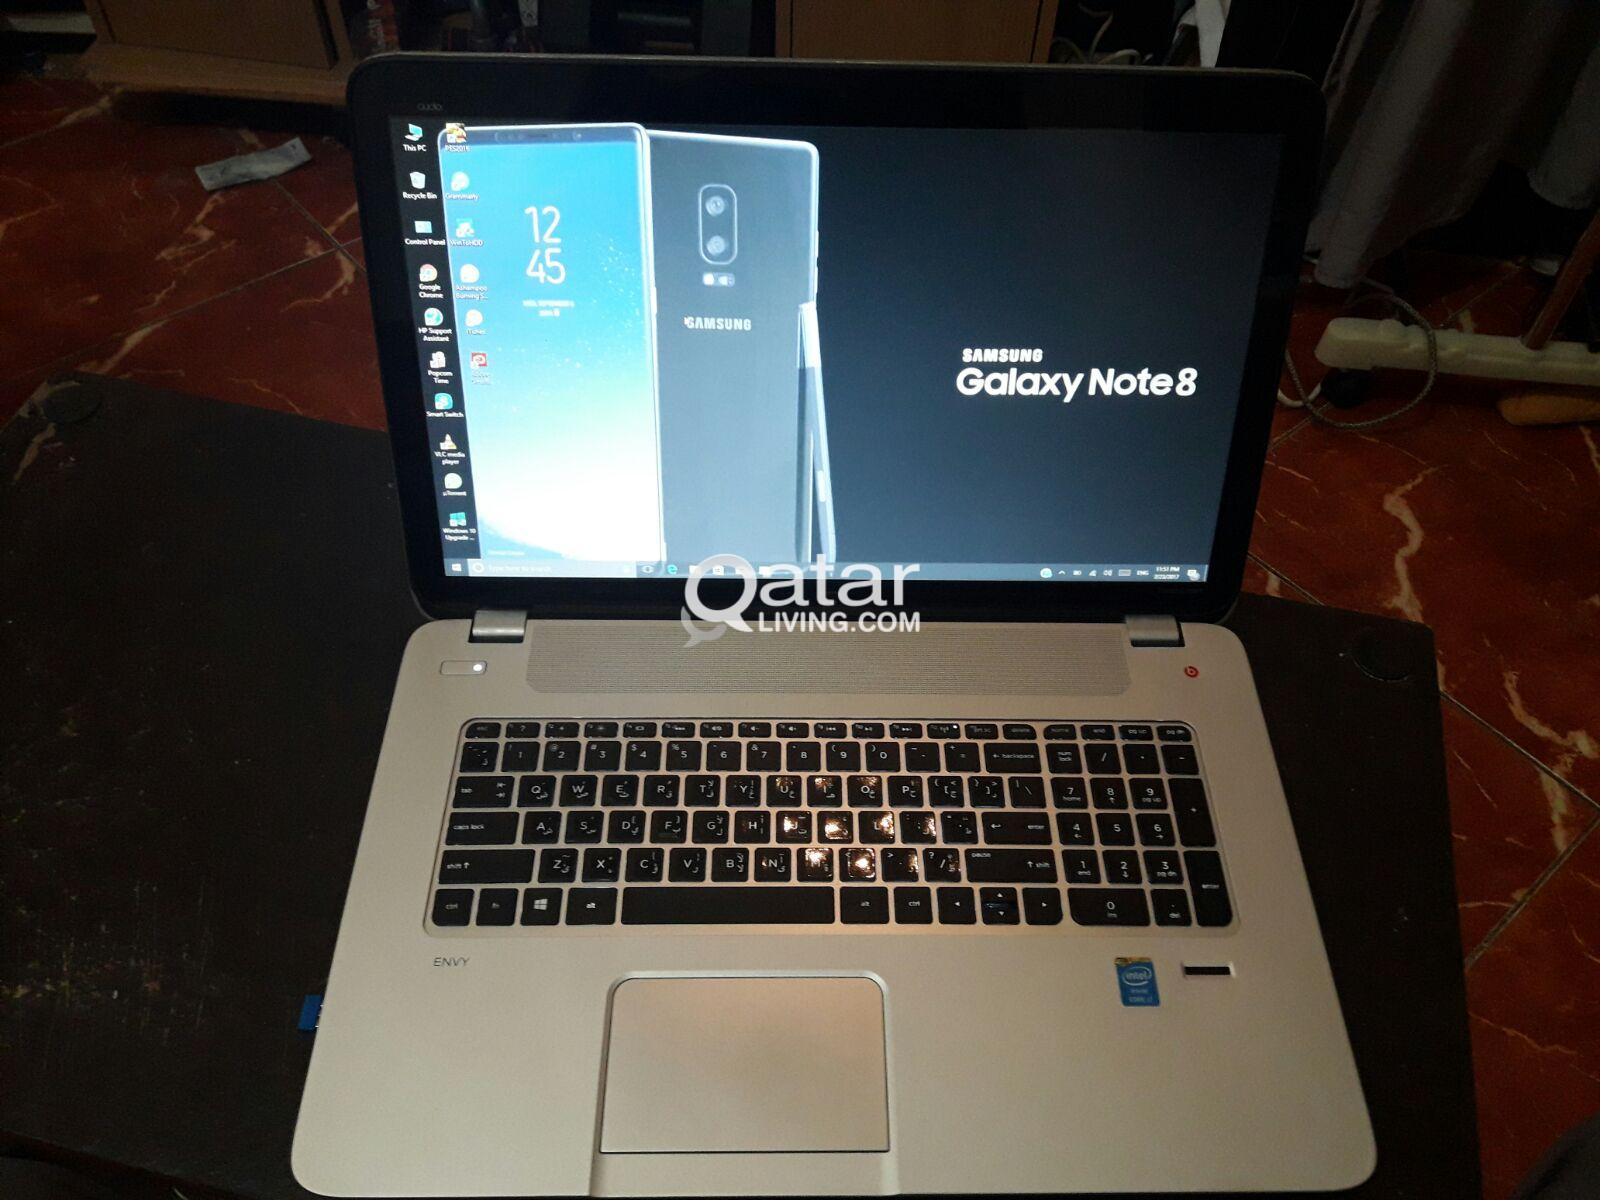 de0fa721e756 HP Envy Laptop i7 Touchscreen 17.3 inch   Qatar Living